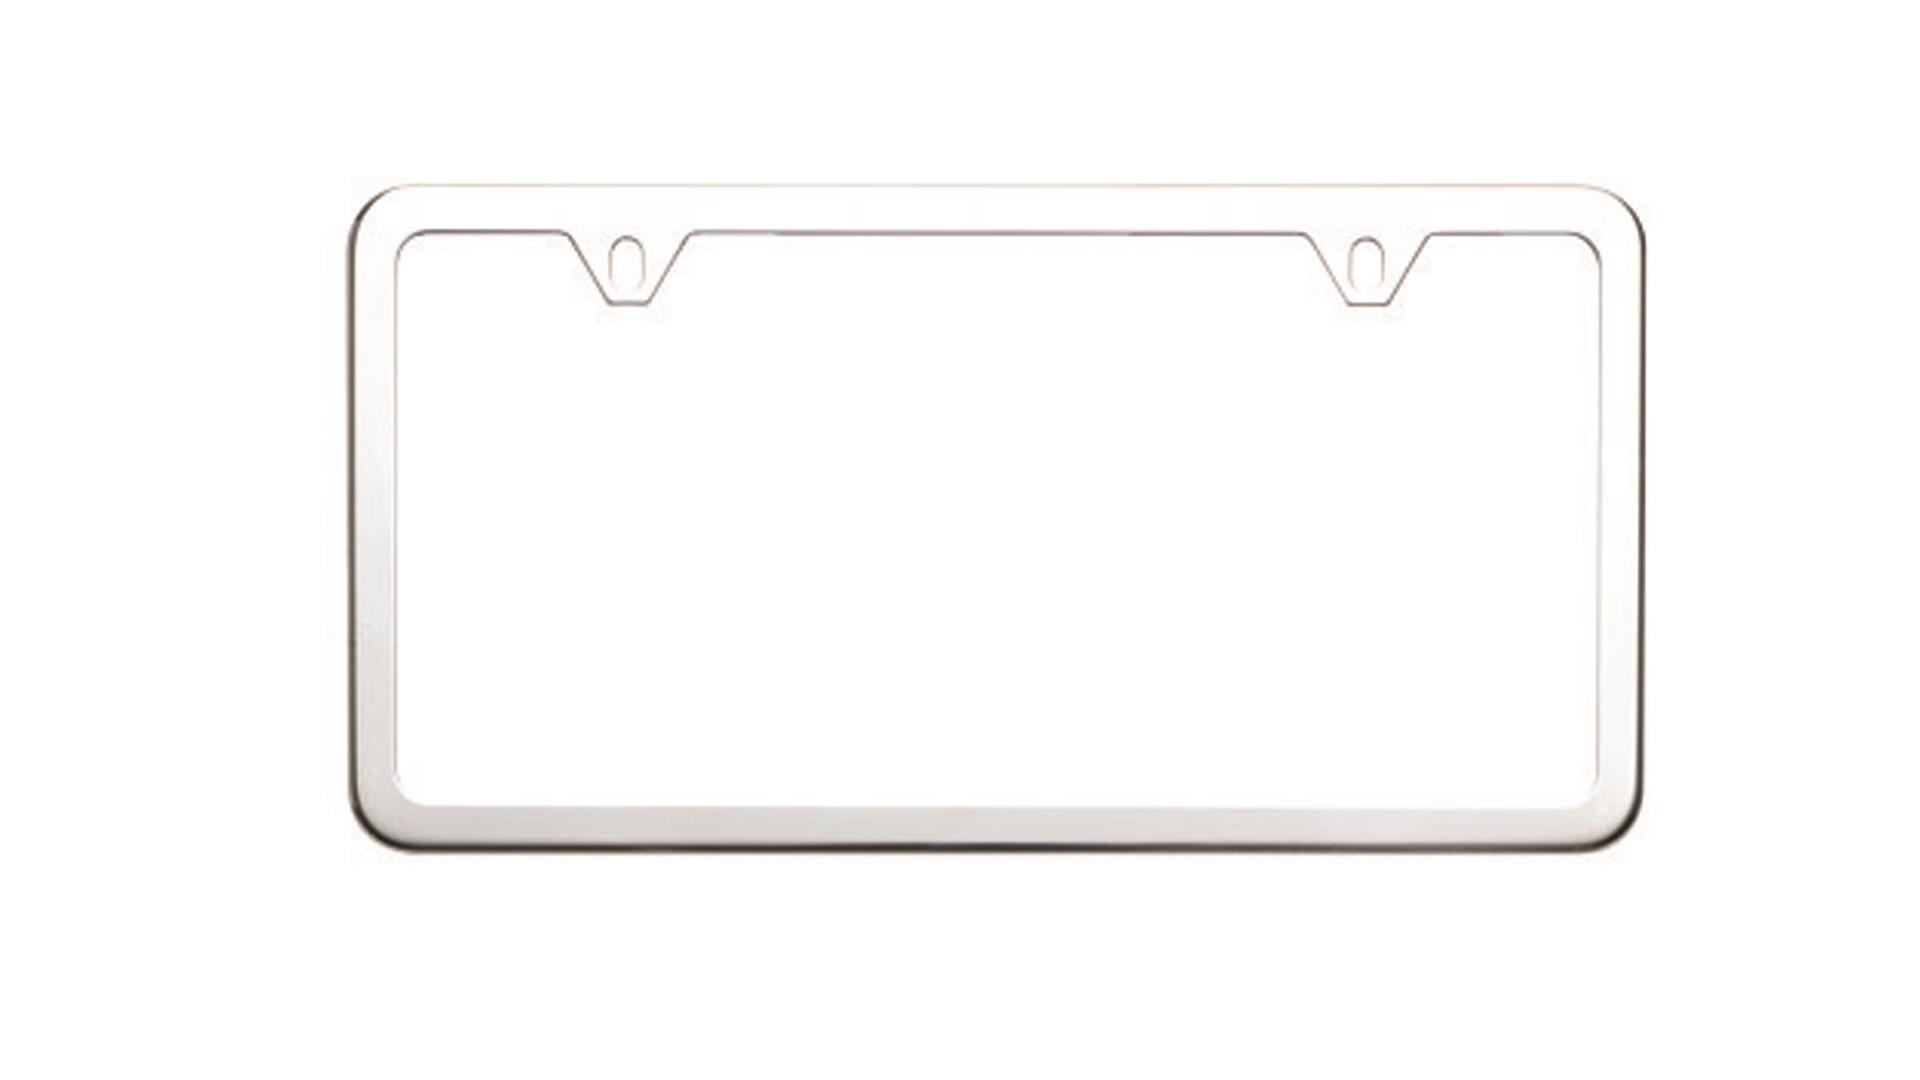 Subaru Forester License Plate Frame, Slim Line, Stainless